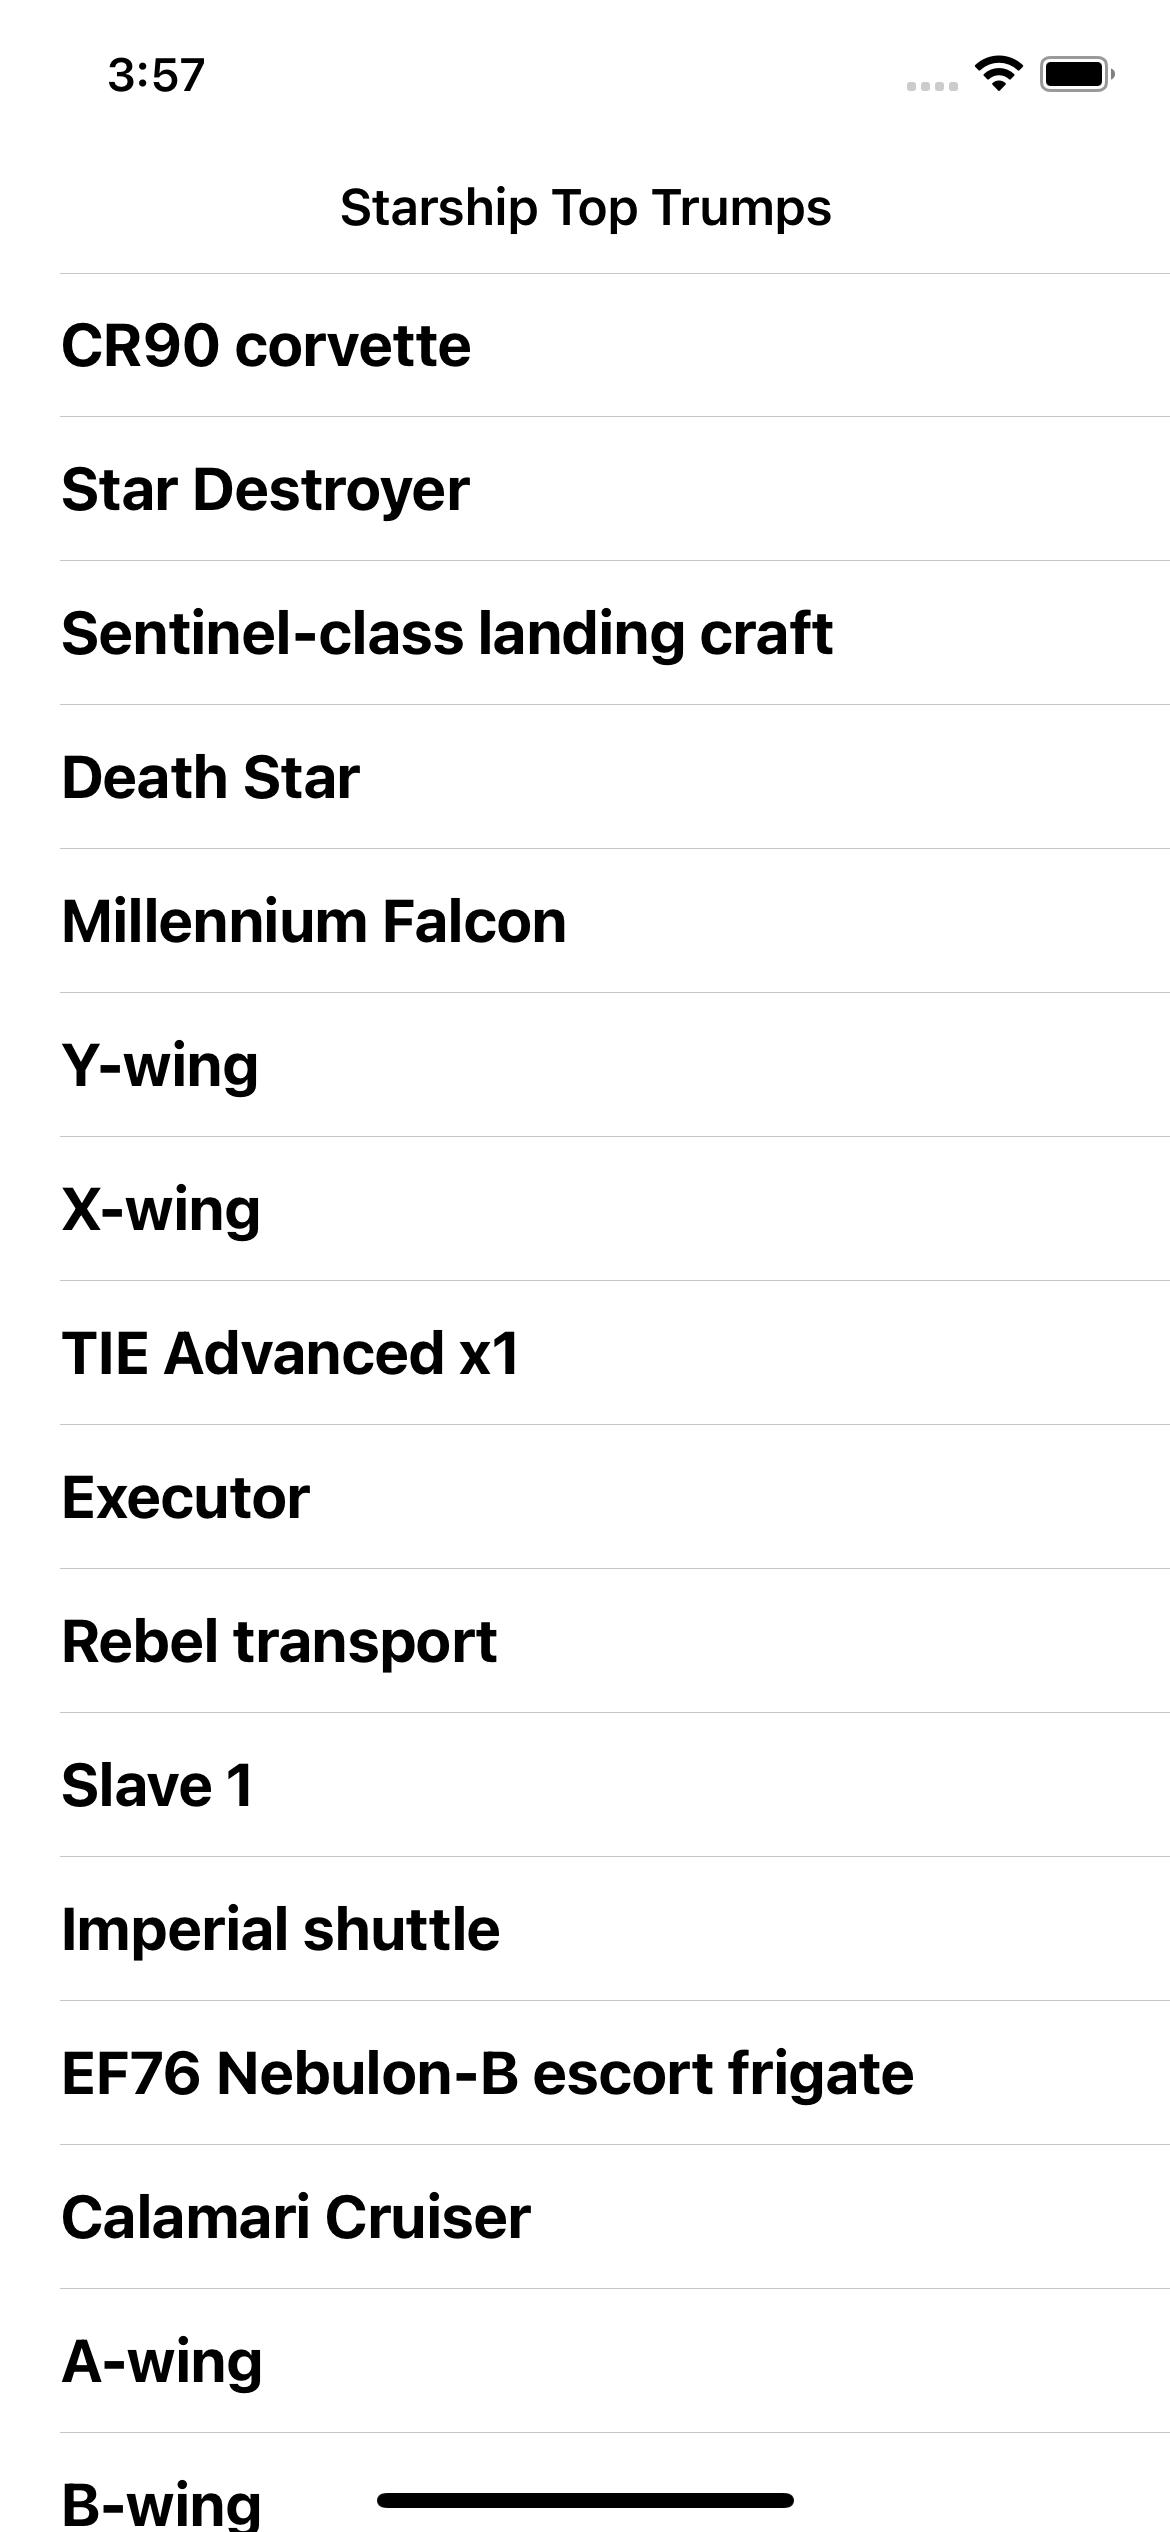 Starting starship list